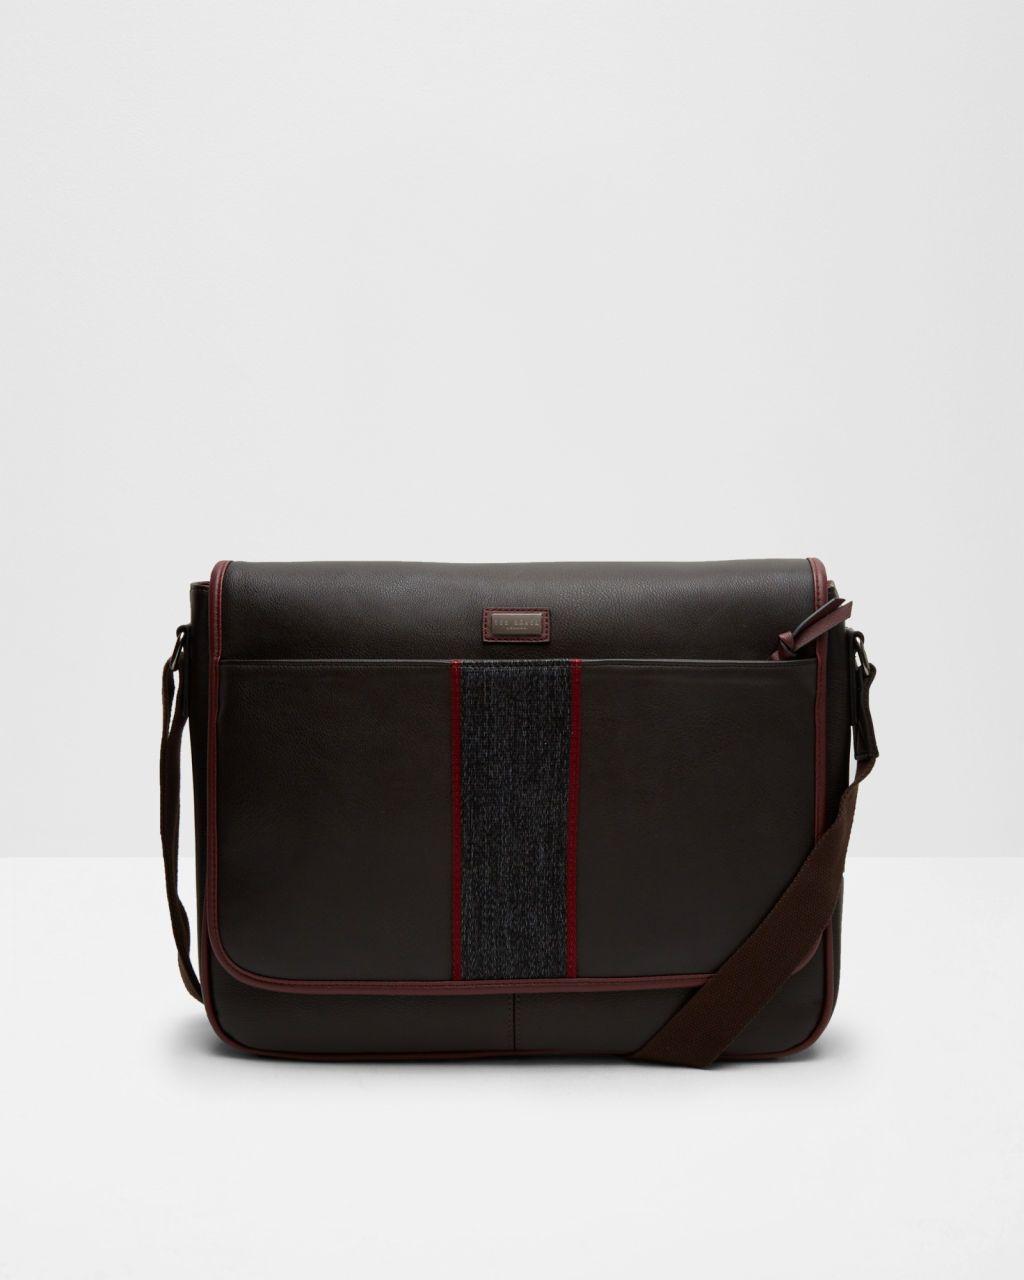 e13fb3dc5141 Webbed striped messenger bag - Chocolate | Bags | Ted Baker ROW ...